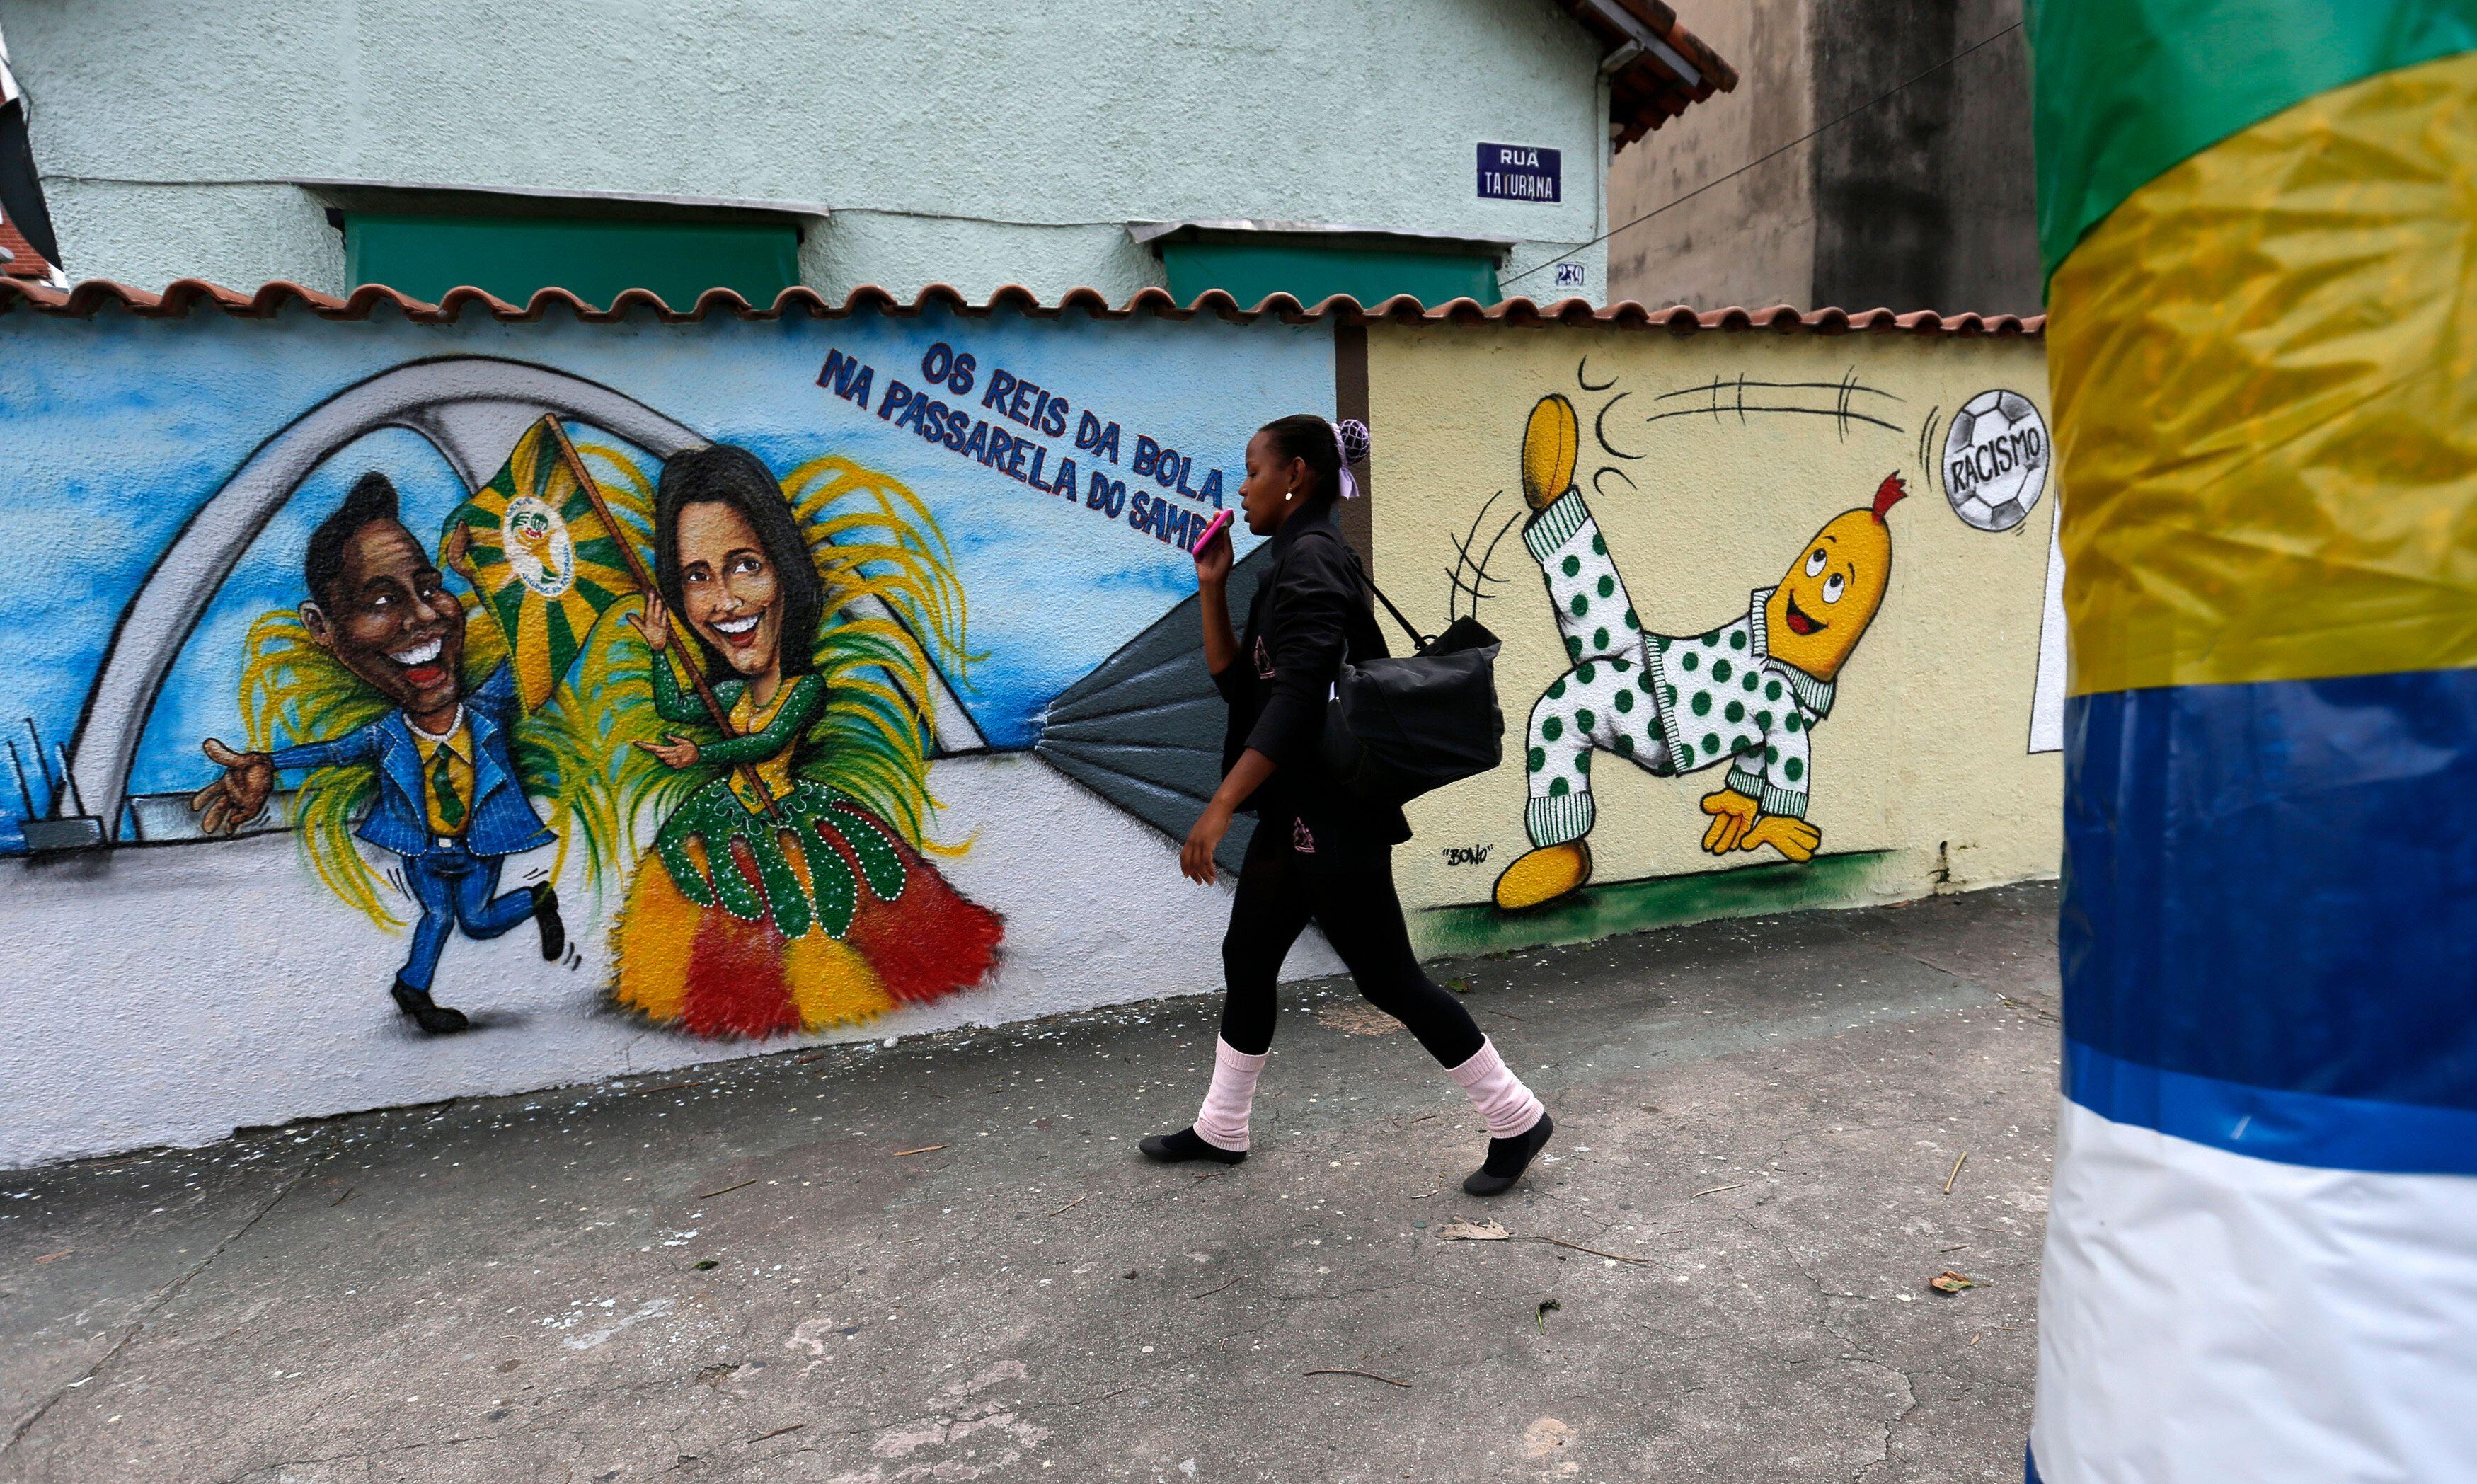 A woman walks past graffiti depicting Brazilian soccer superstars Pelé, left, and Marta, right, ahead of the 2014 Worl